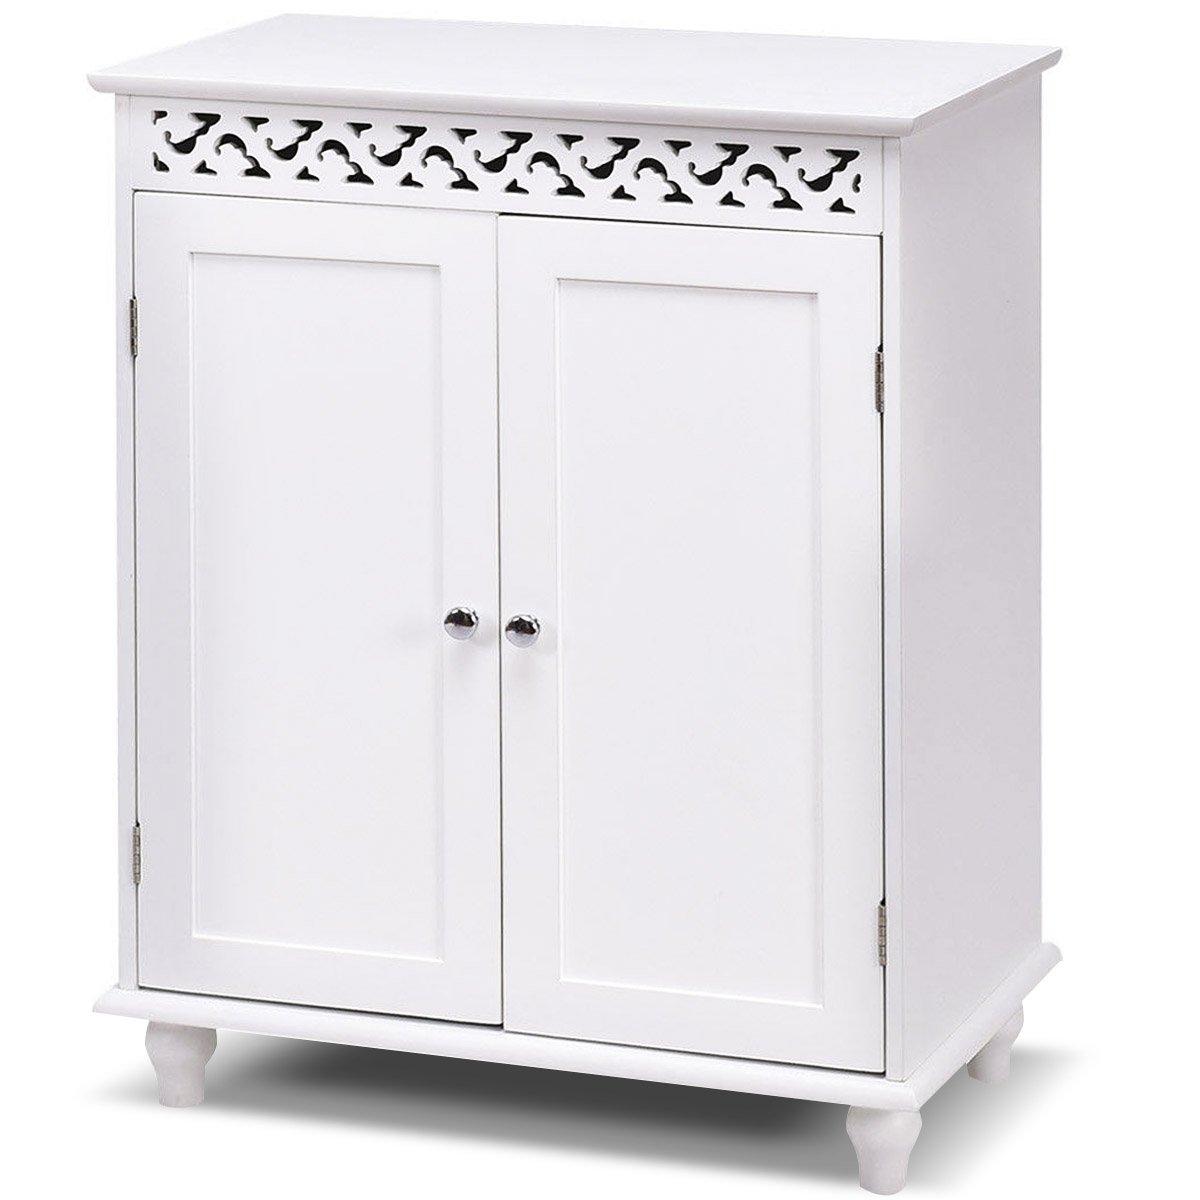 Tangkula Floor Cabinet White Wooden Free Standing Bathroom 2 Shelves Storage Cabinet